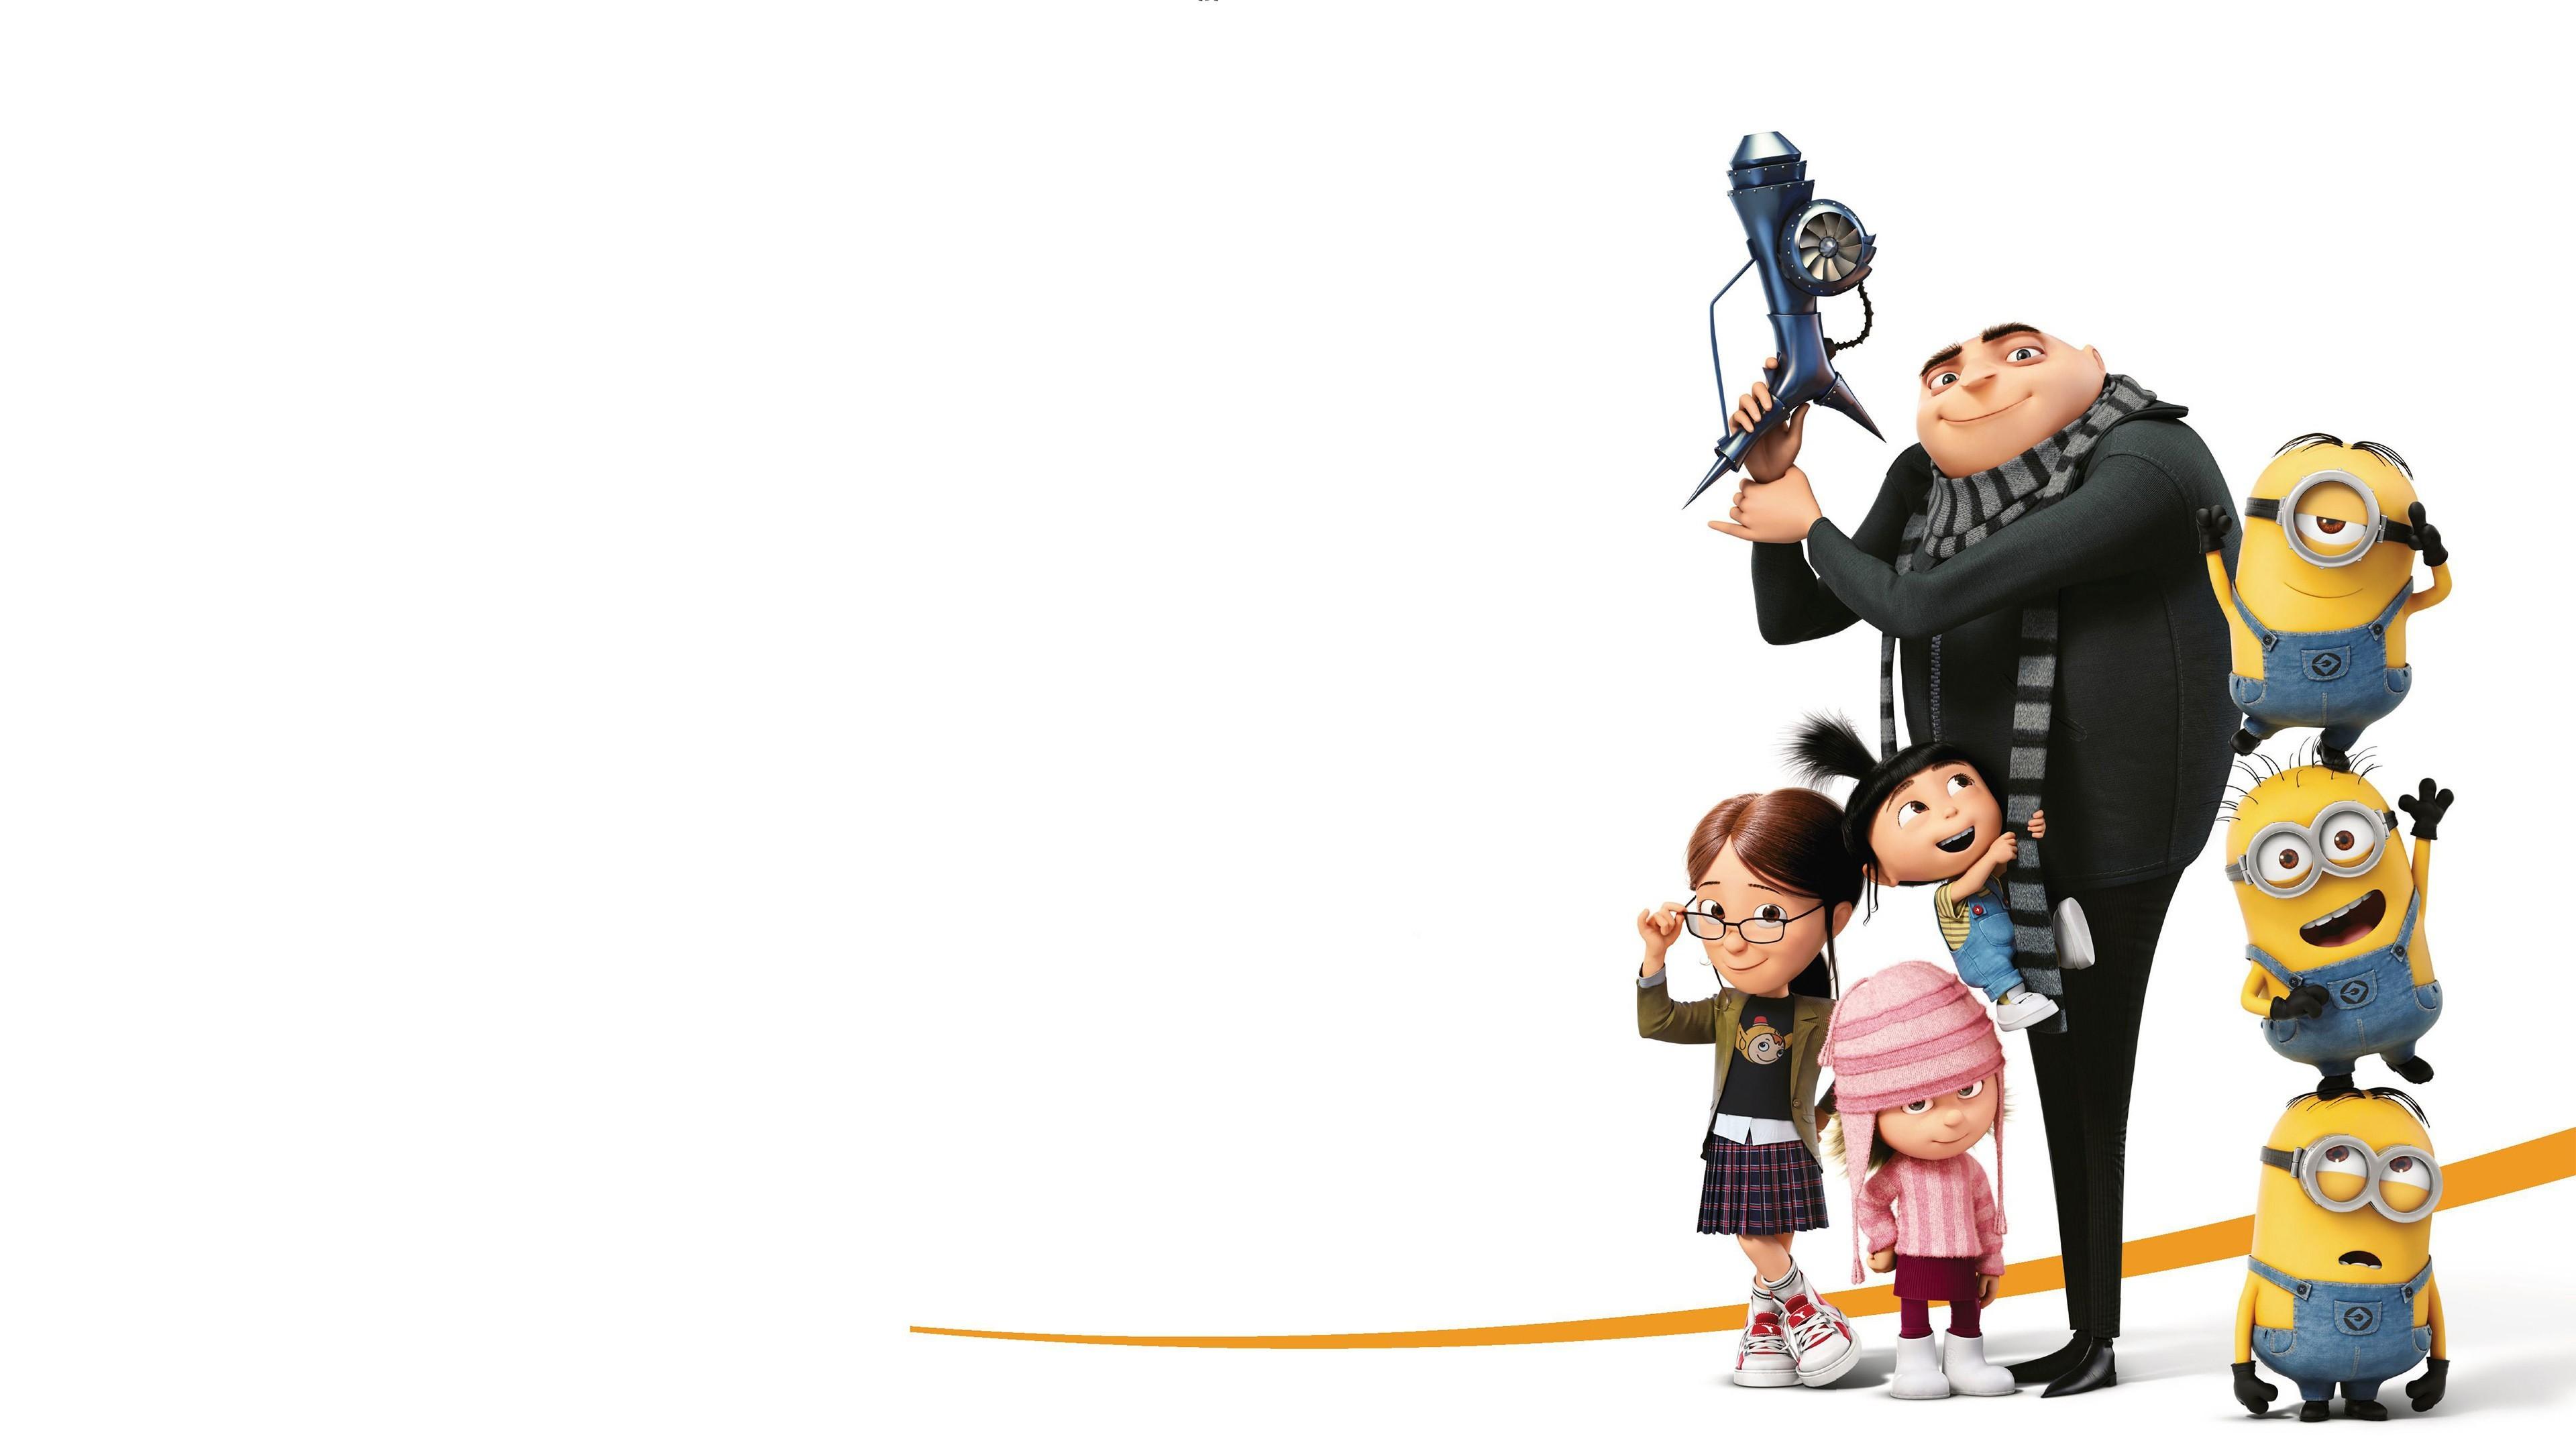 3840x2160 Movie - Despicable Me 3 Gru (Despicable Me) Agnes (Despicable Me)